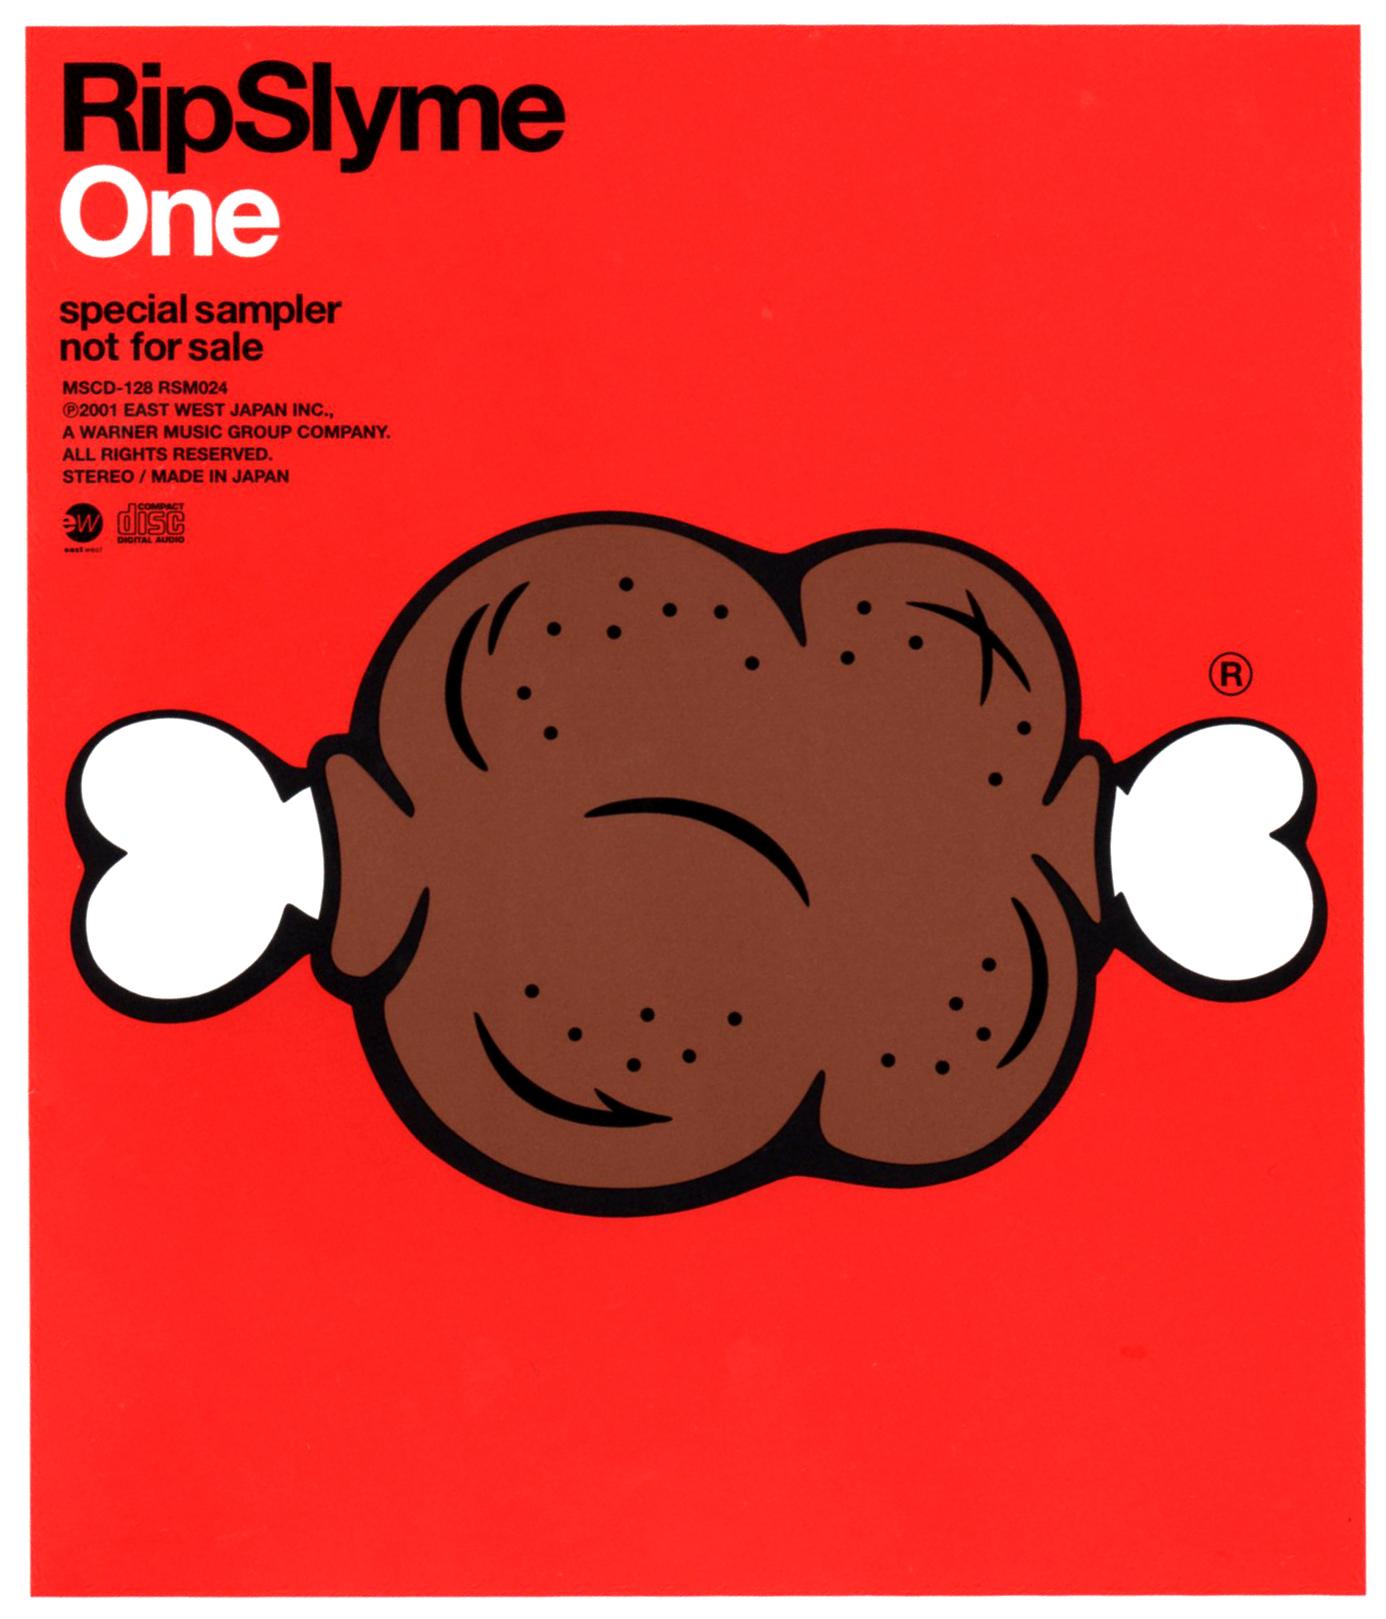 RIP SLYME (リップスライム) 3rdシングル『One (ワン)』(special sampler) 高画質CDジャケット画像